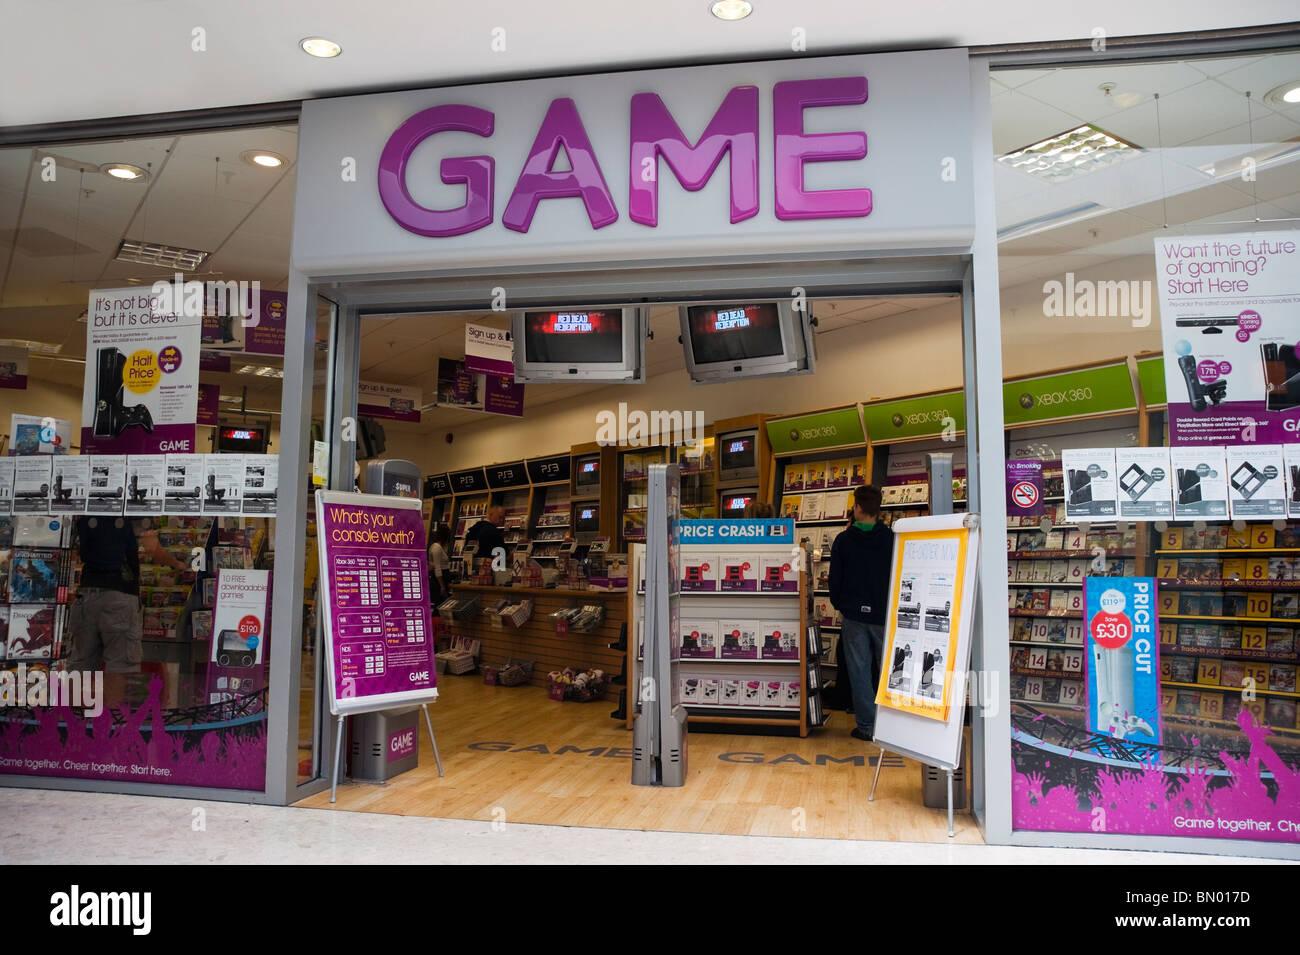 Online pc game shop